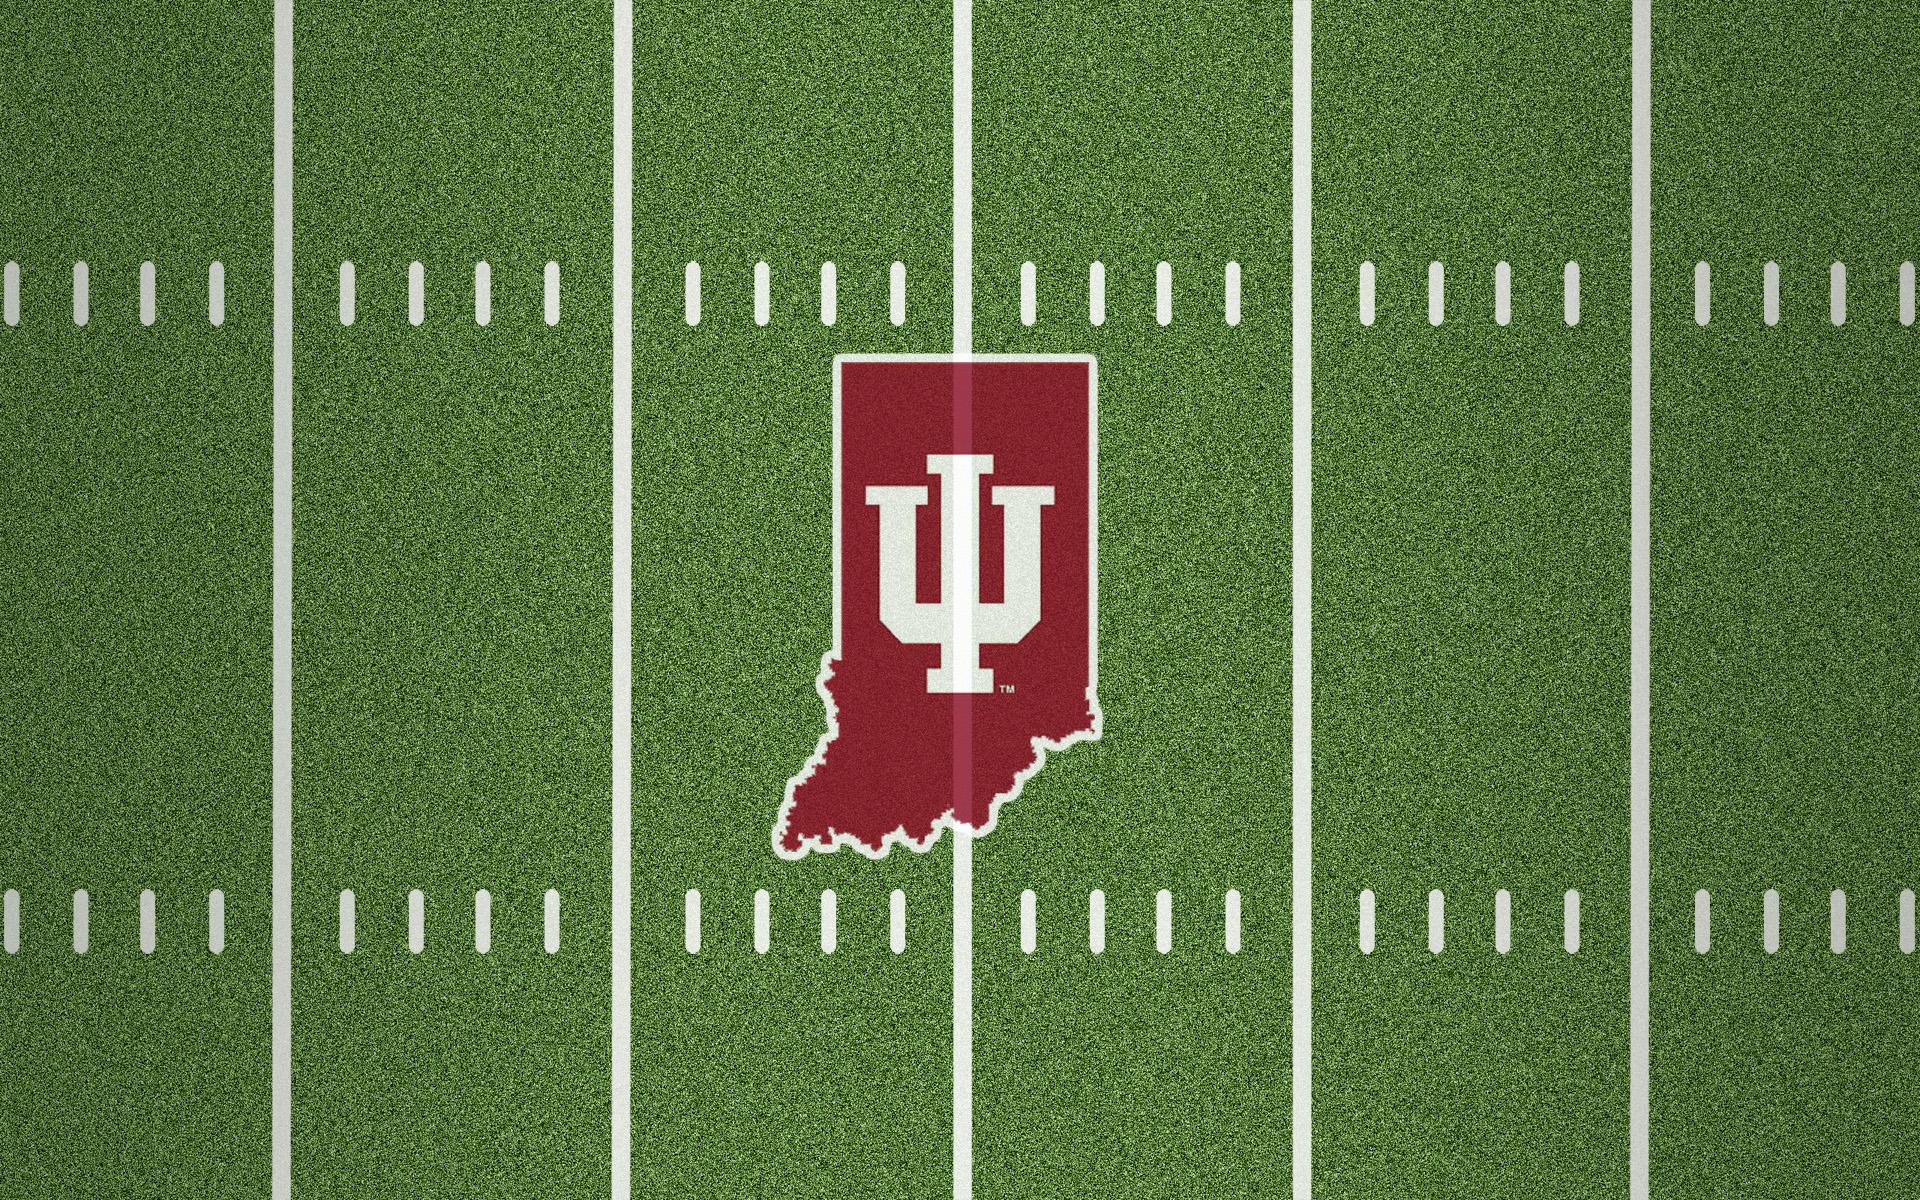 Indiana Hoosiers Football wallpaper   1113143 1920x1200